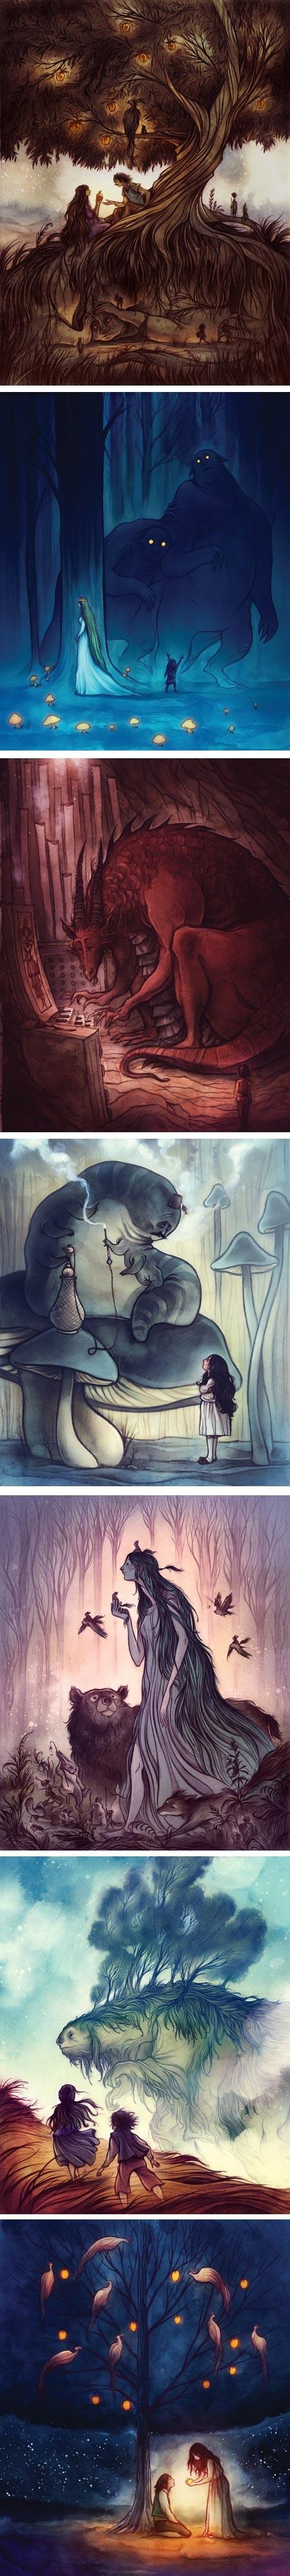 fairy-tales-cory-godbey.jpg (448 KB)